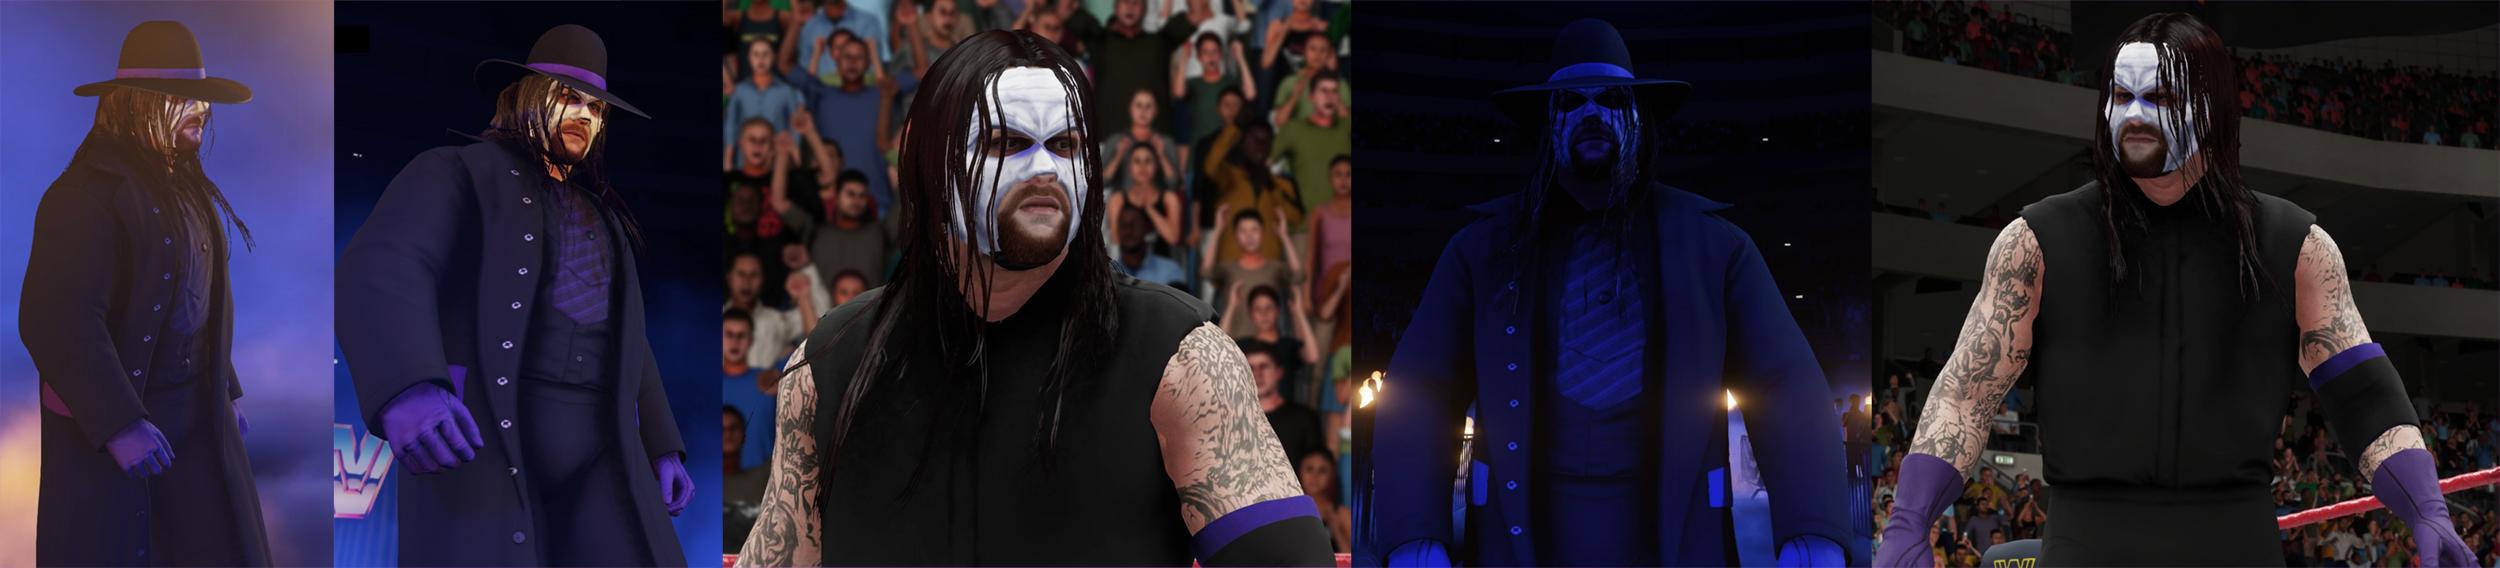 Undertaker-Mask.jpg